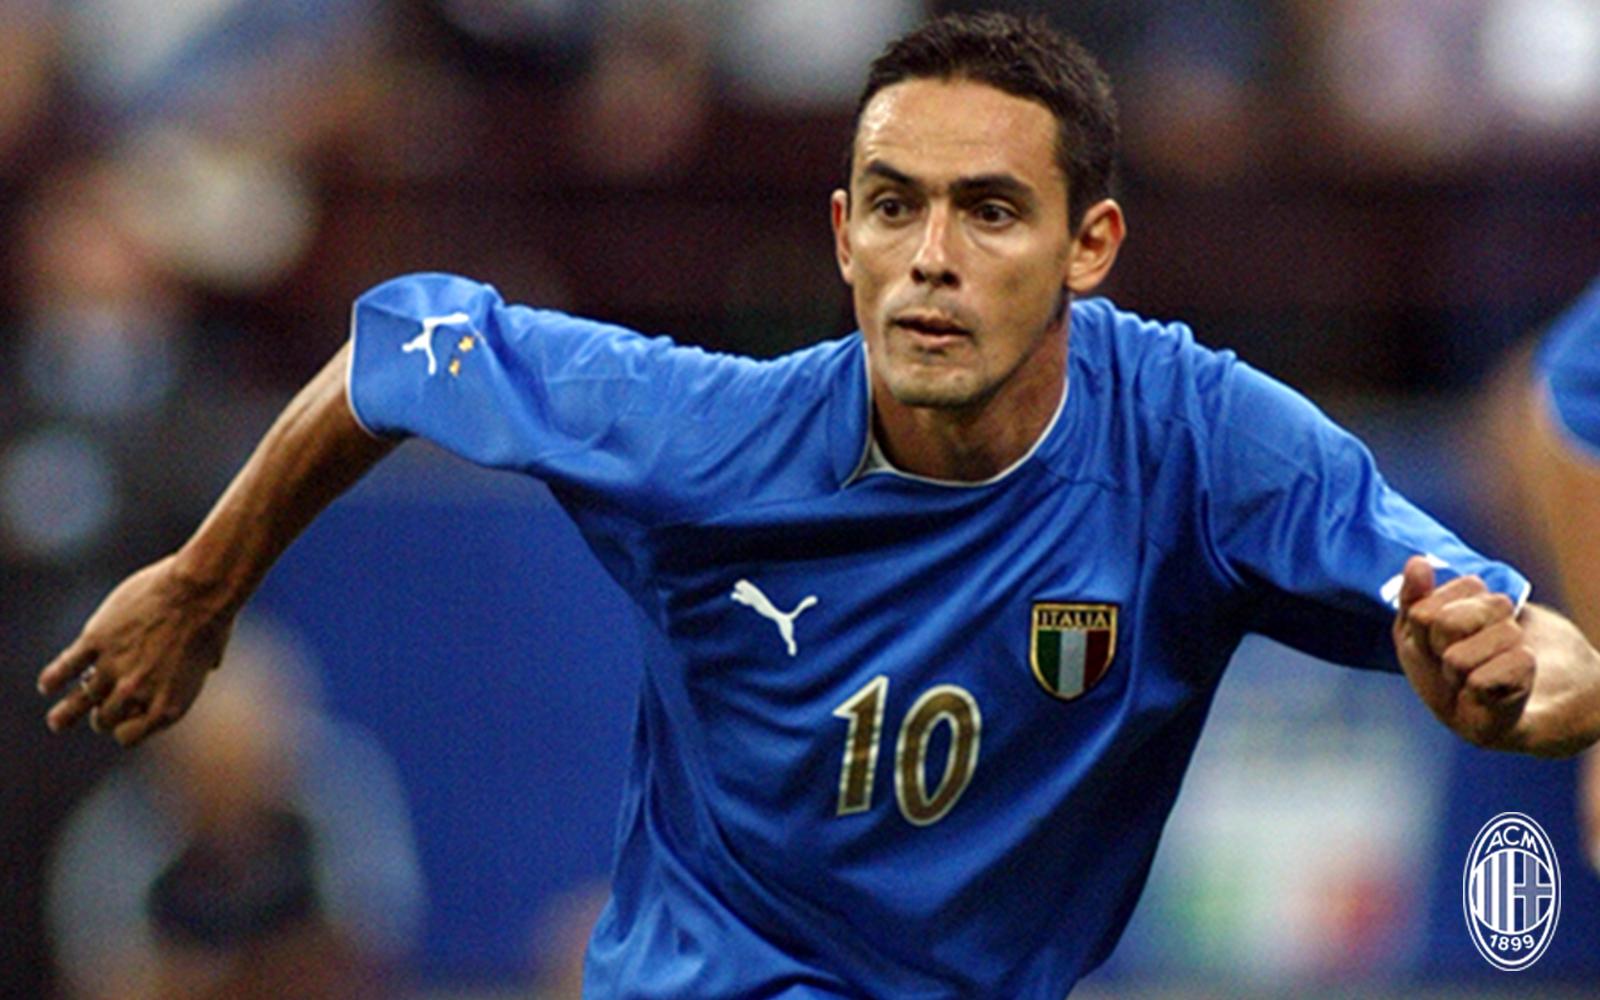 News-TBT-Inzaghi-Italia-06.09.18 - Copy (1).png.jpg